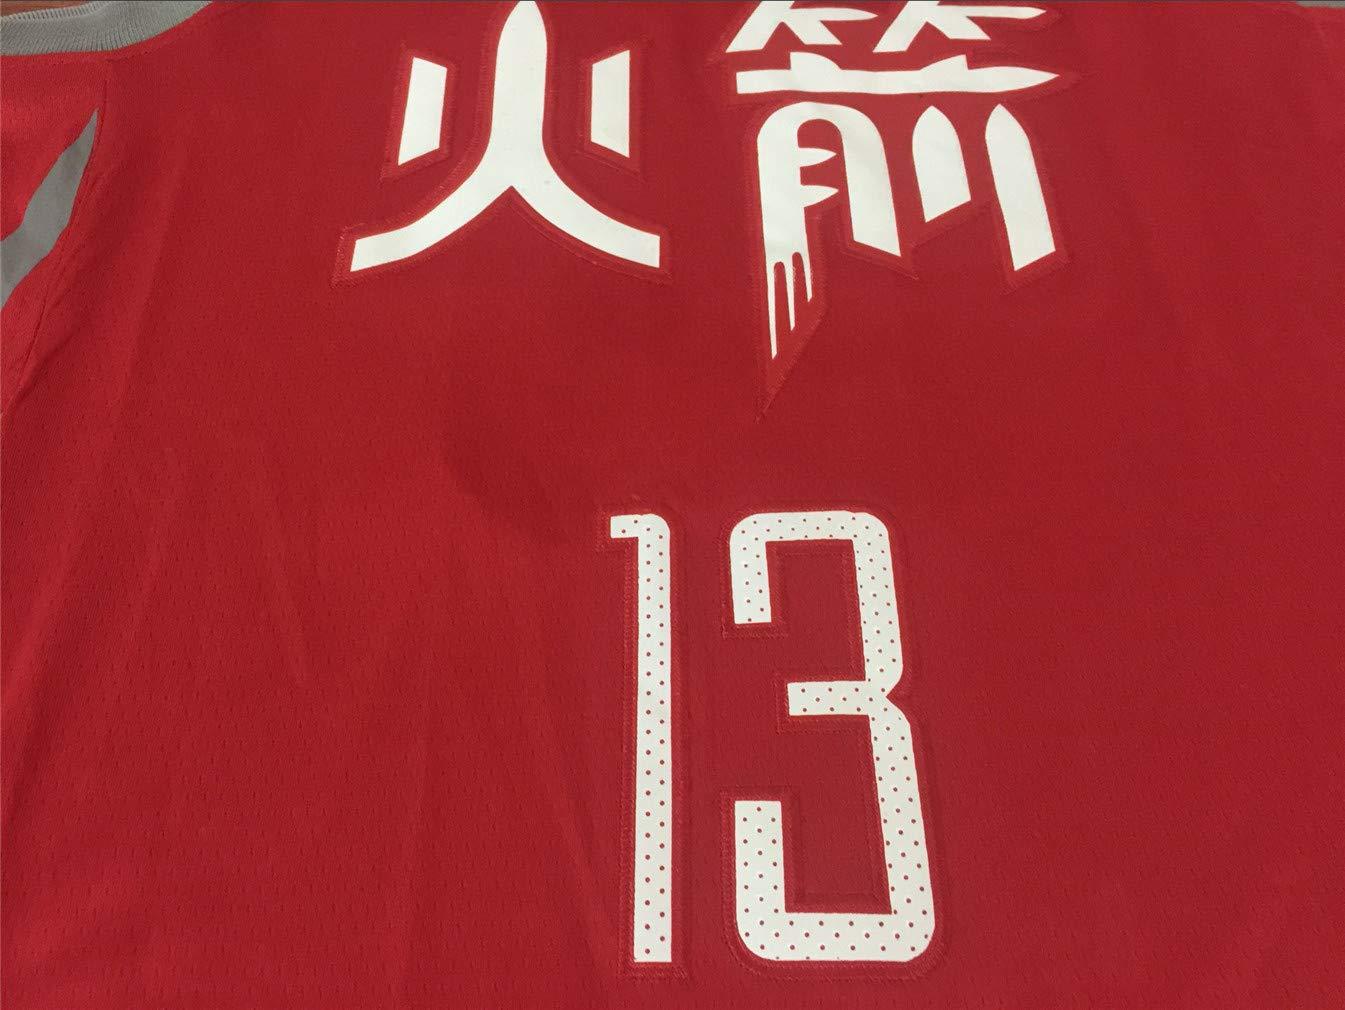 Swingman Ricamata Abbigliamento Sportivo Basket Jersey Maglia Canotta 13 Westbrook Nr NBA Houston Rockets Harden Nr